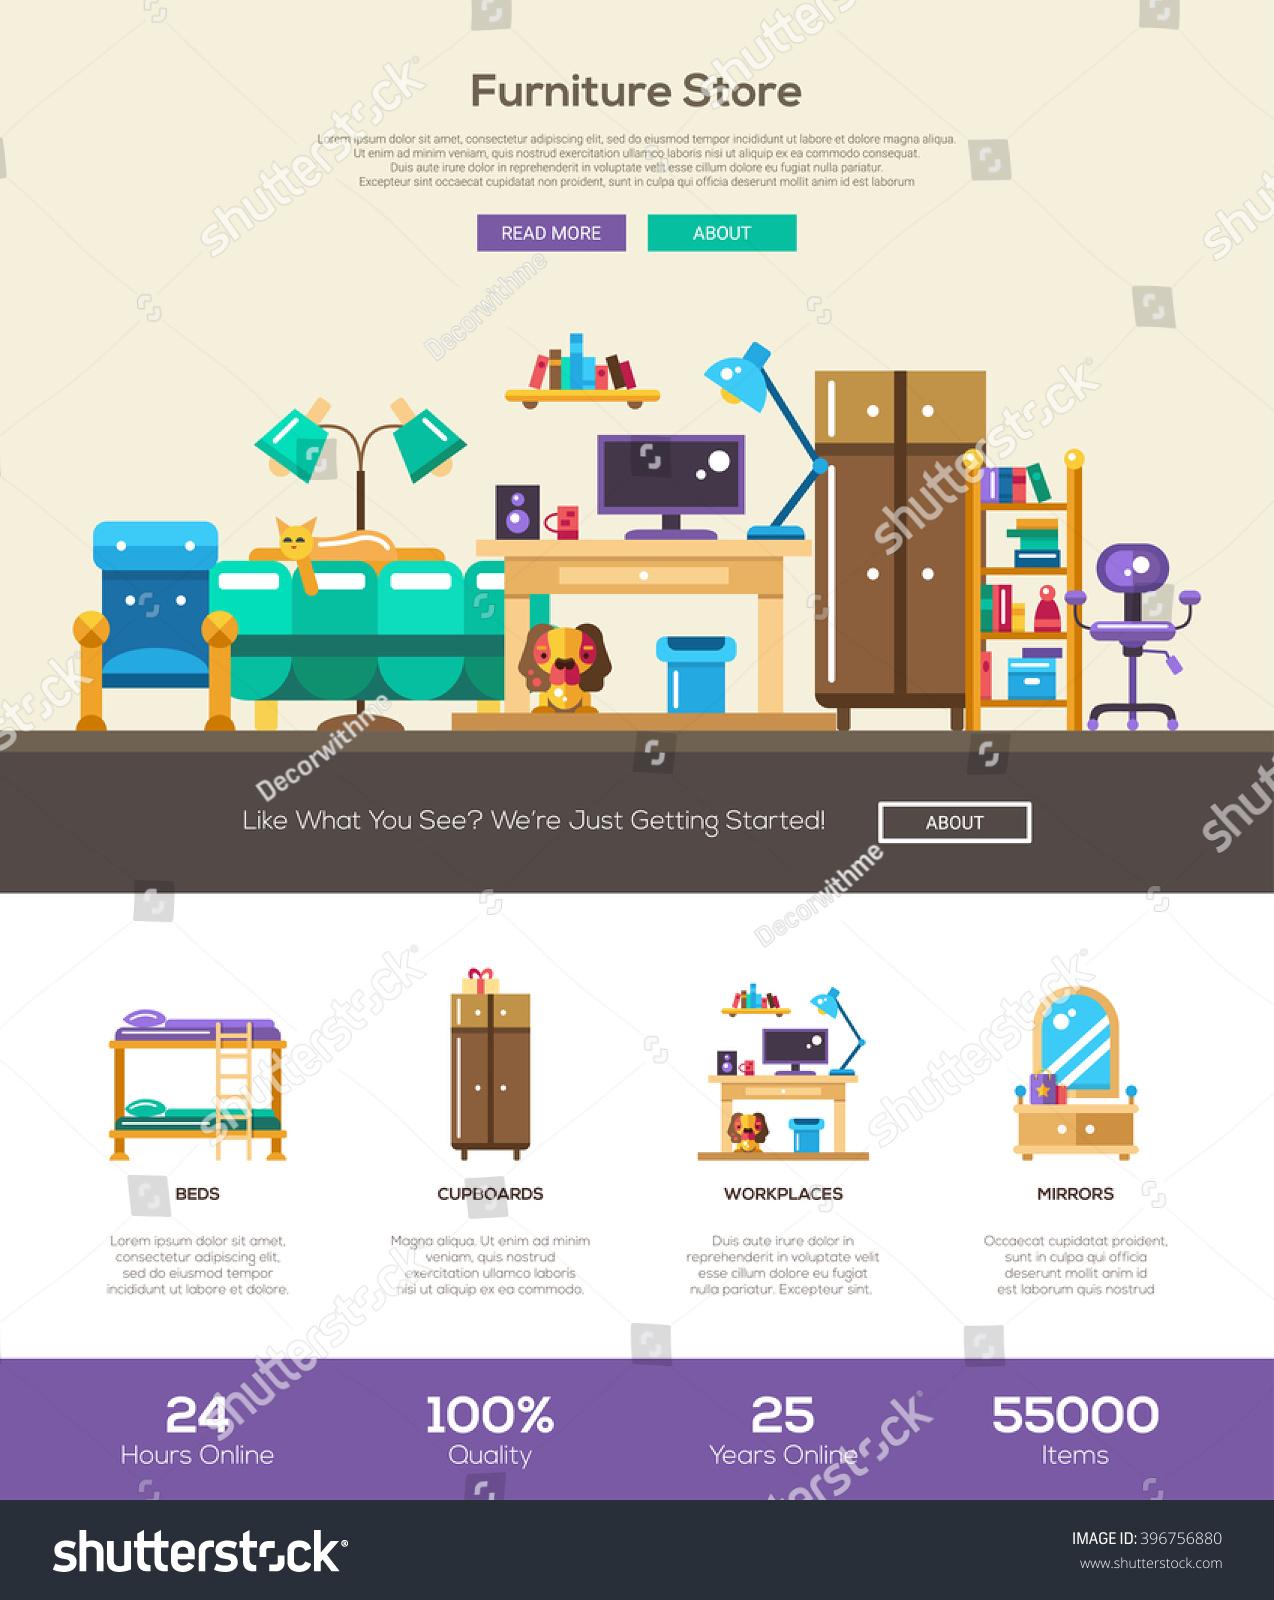 house interior domestic furniture online store stock vector 396756880 shutterstock. Black Bedroom Furniture Sets. Home Design Ideas